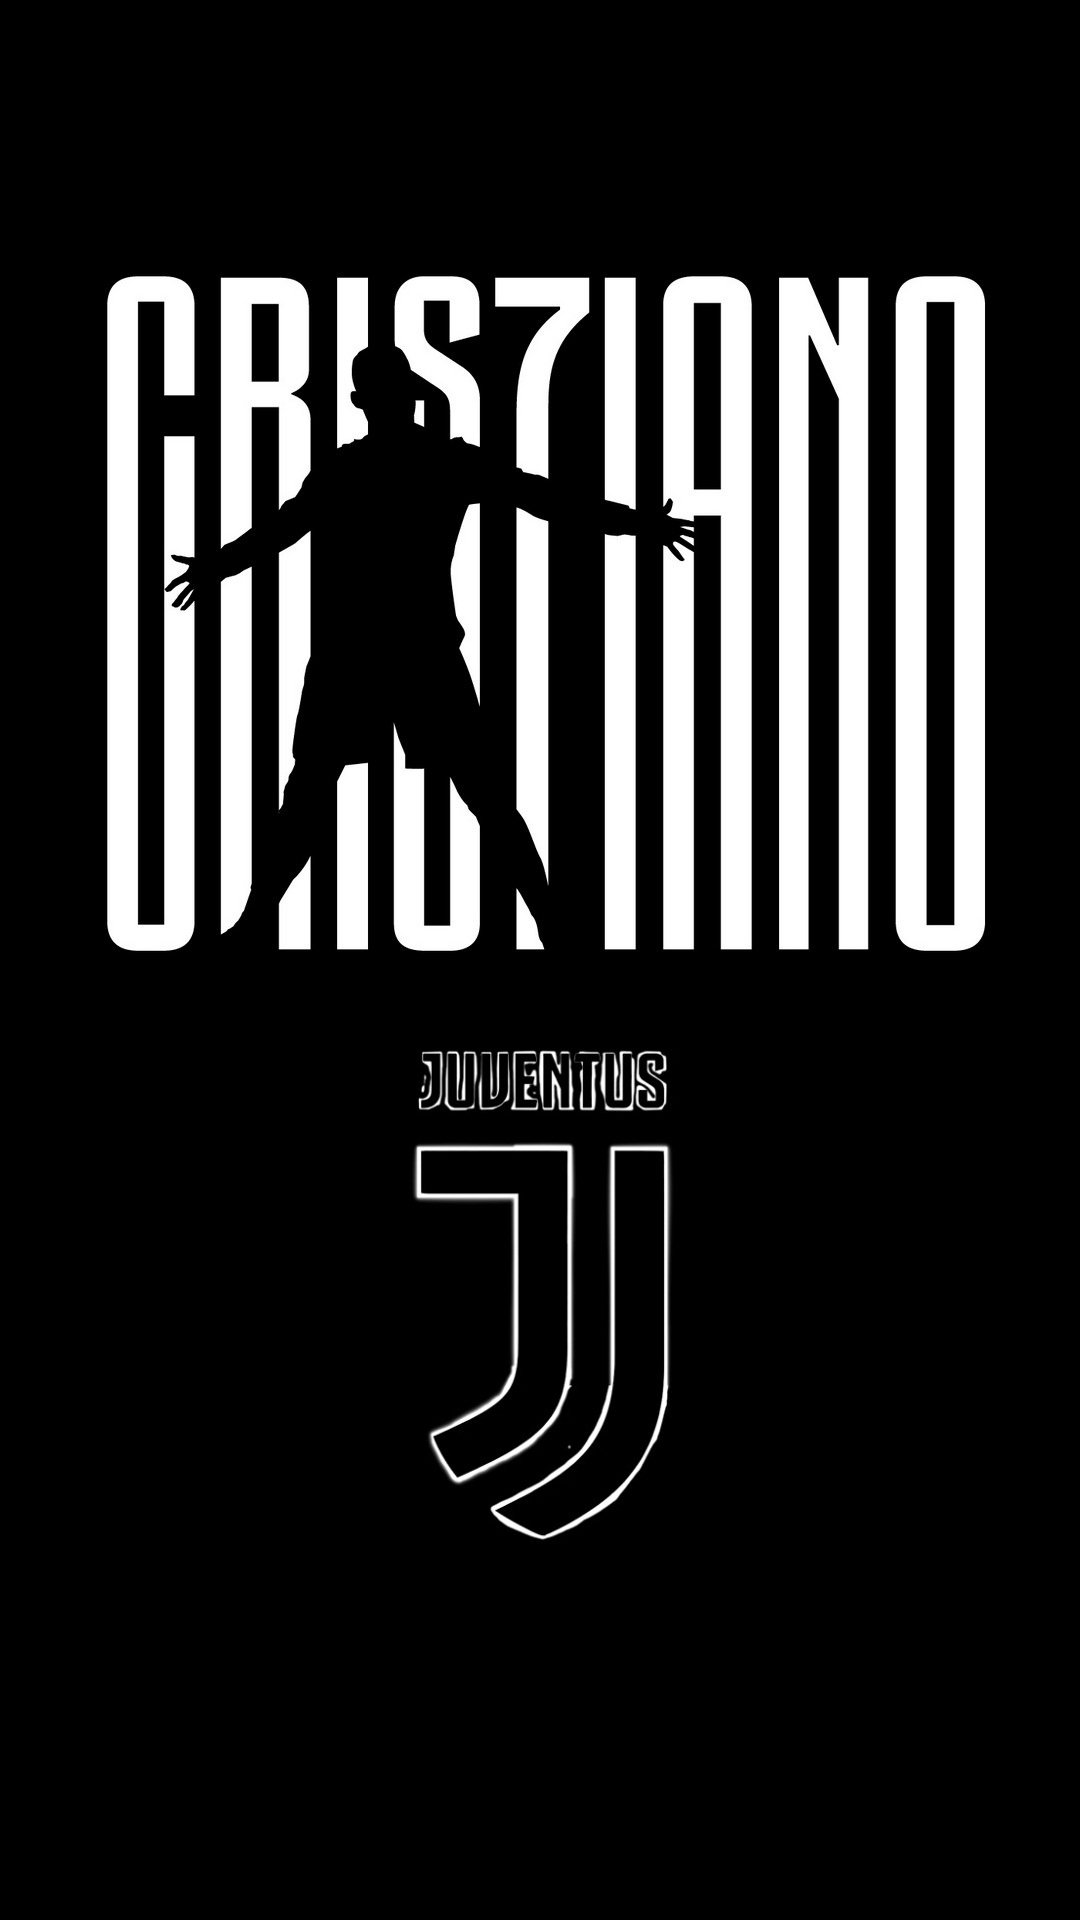 iPhone X Wallpaper C Ronaldo Juventus 2020 3D iPhone Wallpaper 1080x1920